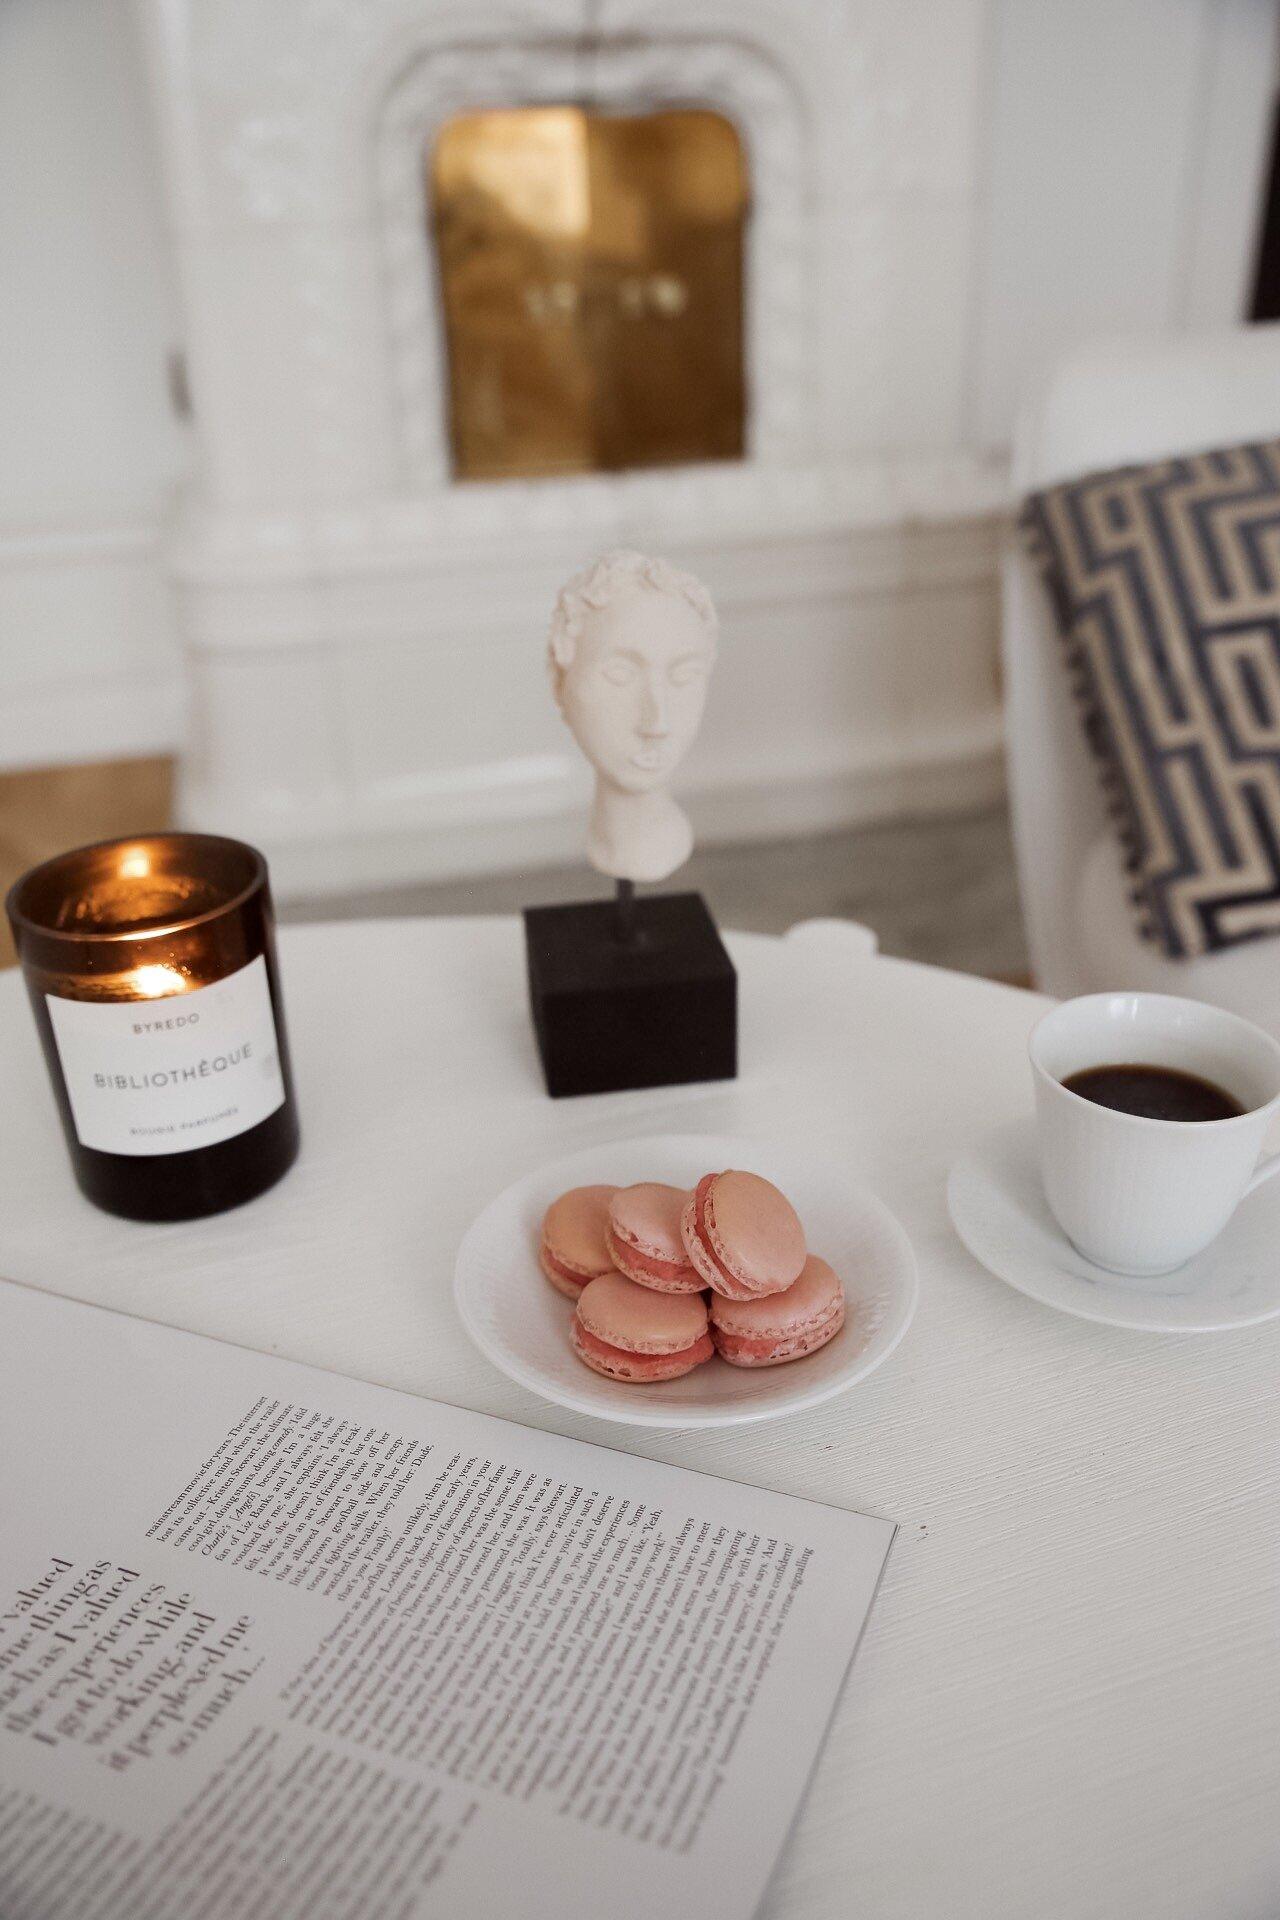 byredo macarons kaffe vardagsrum inredning sekelskifte kakelugn blogg.jpeg